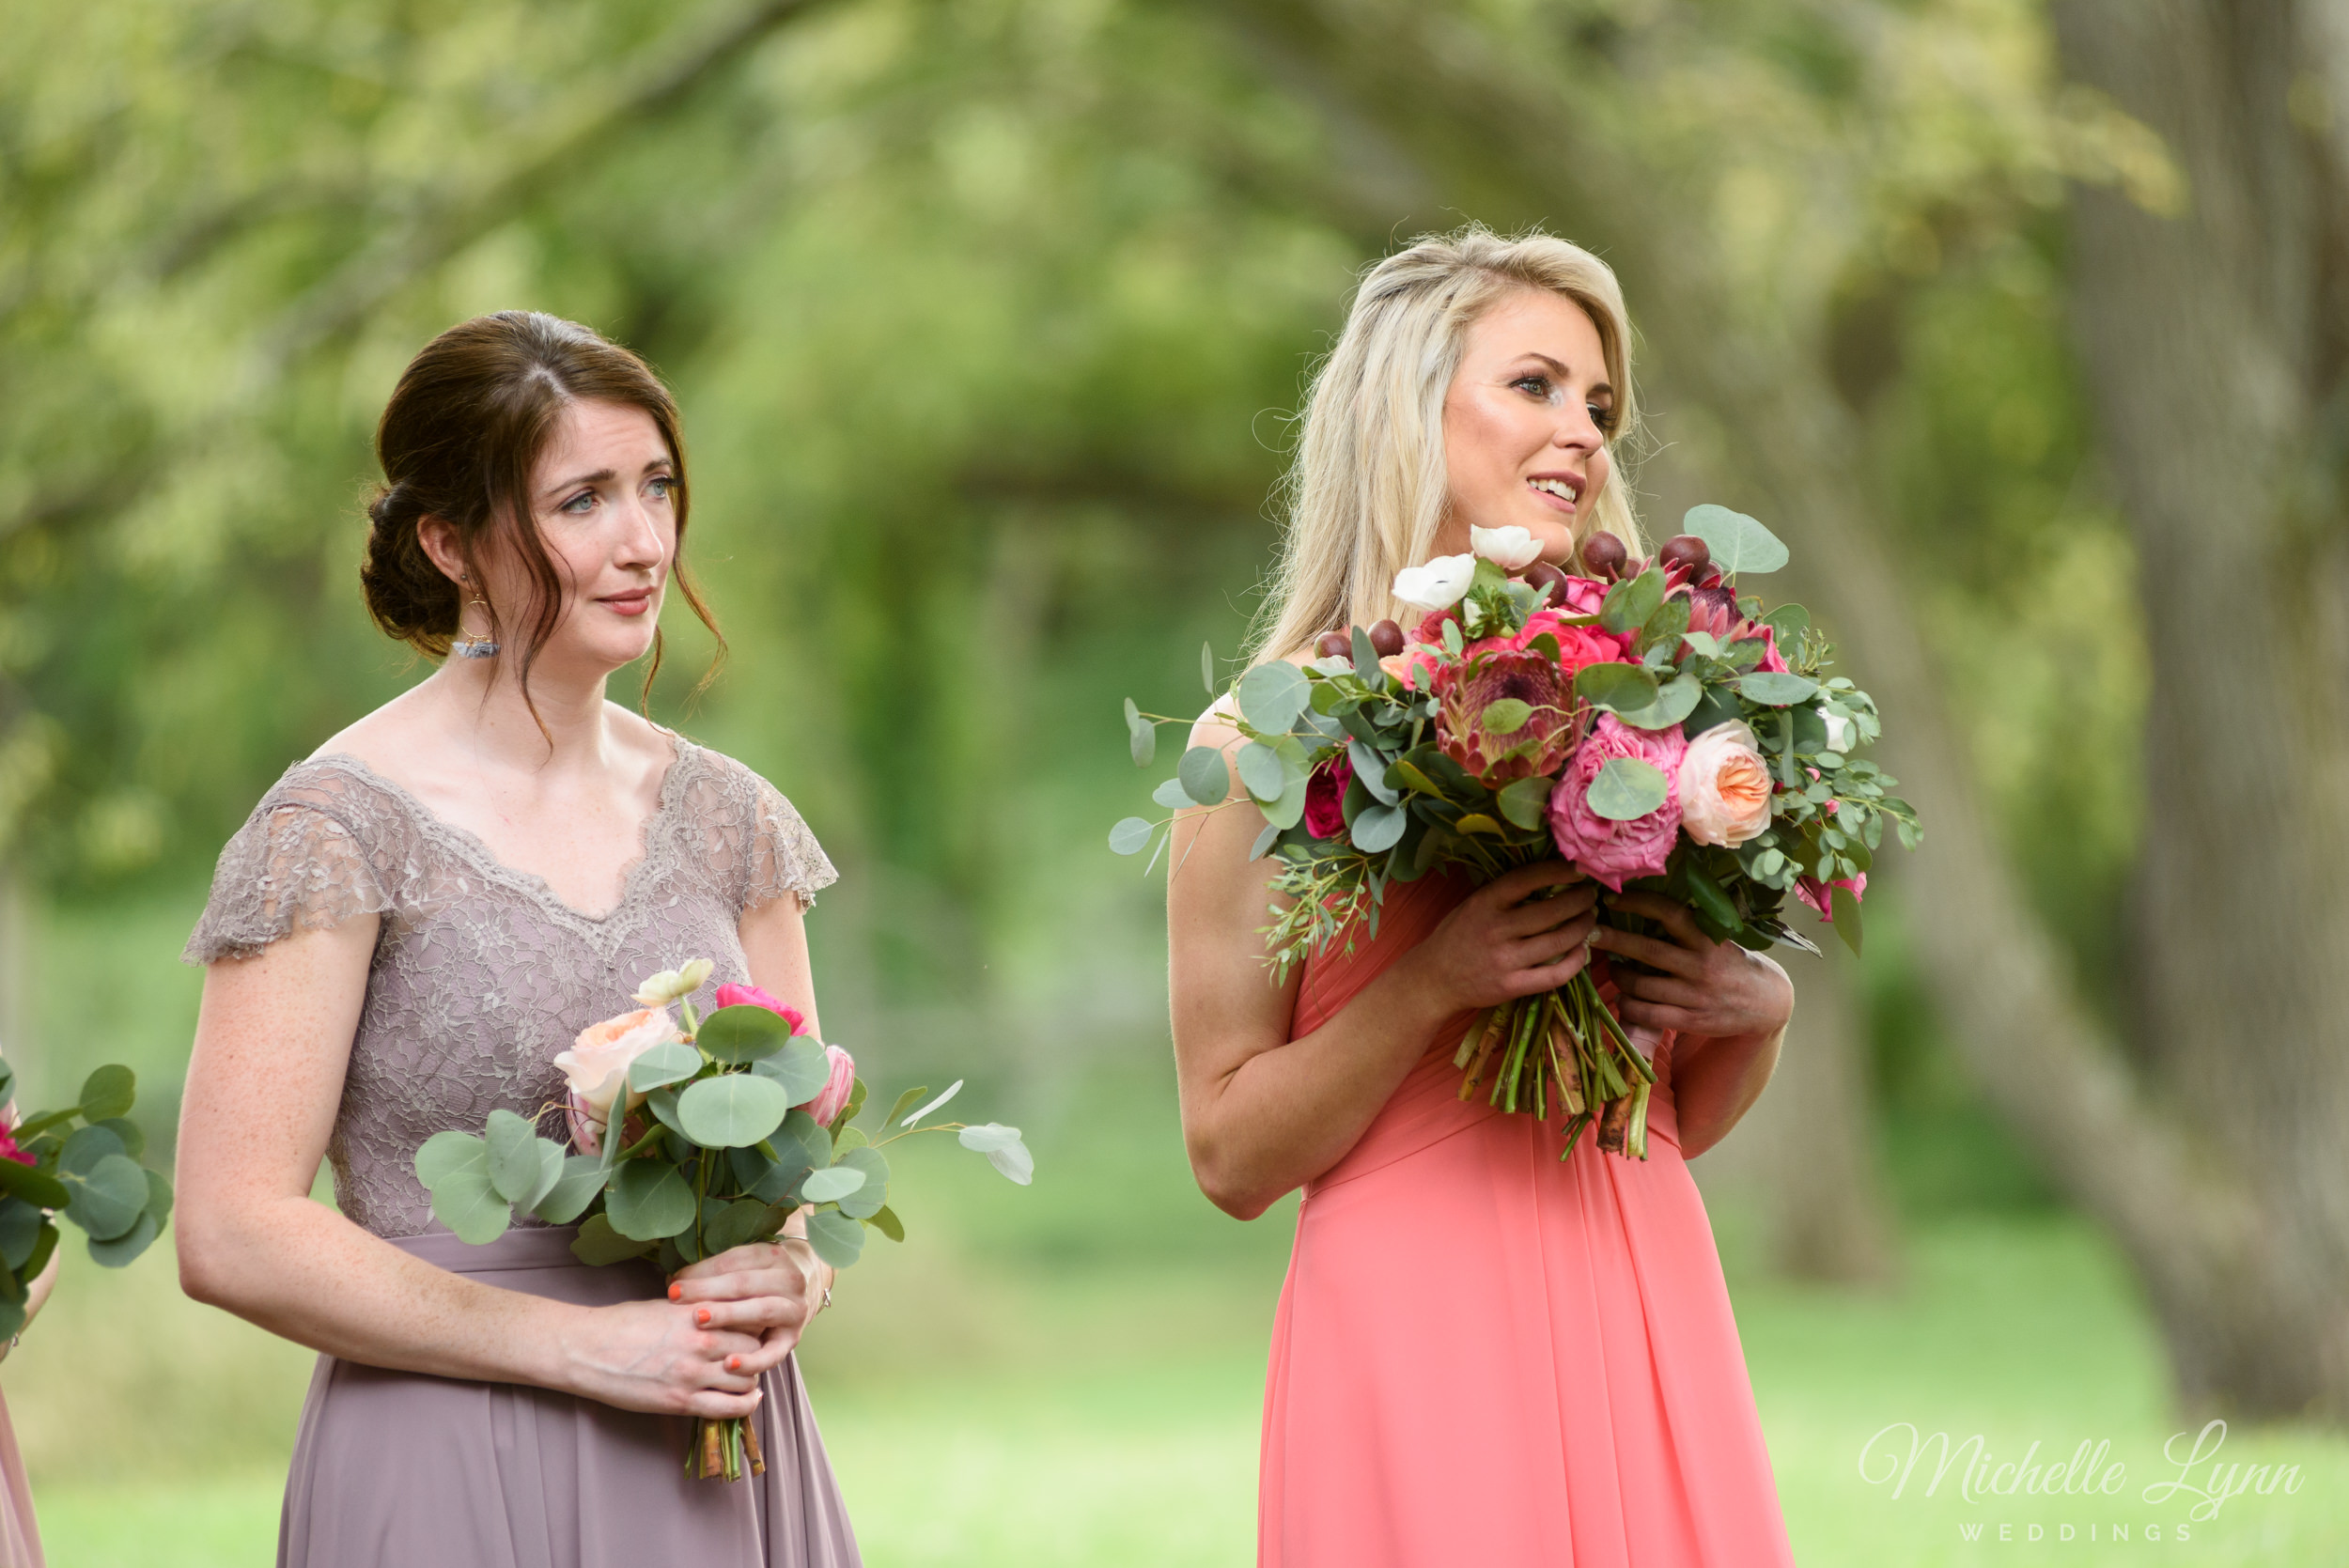 mlw-unionville-vineyards-nj-wedding-photography-41.jpg